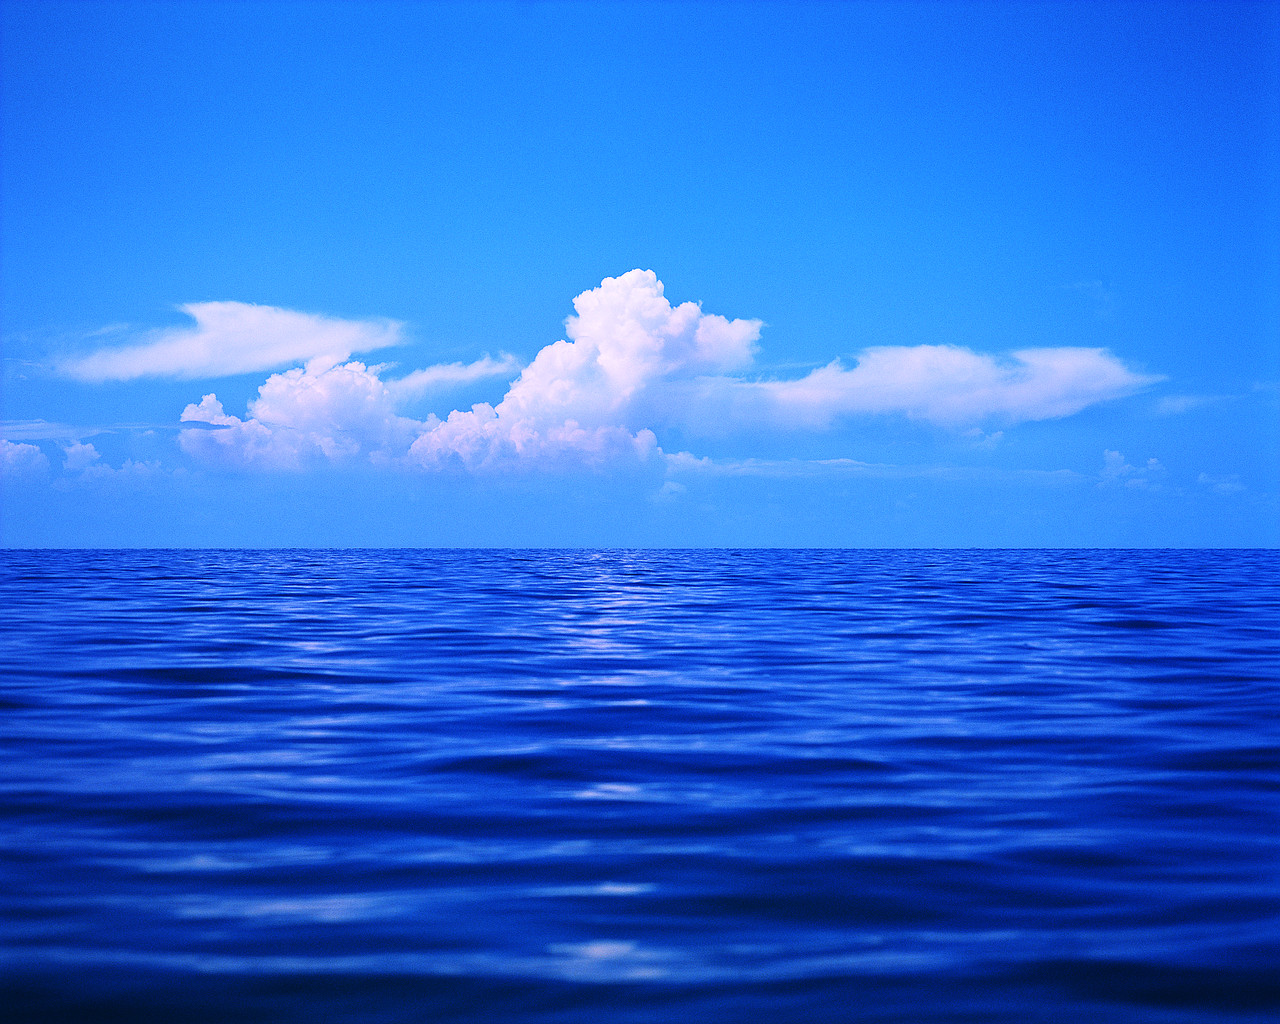 Ocean sea clipart the cliparts-Ocean sea clipart the cliparts-7